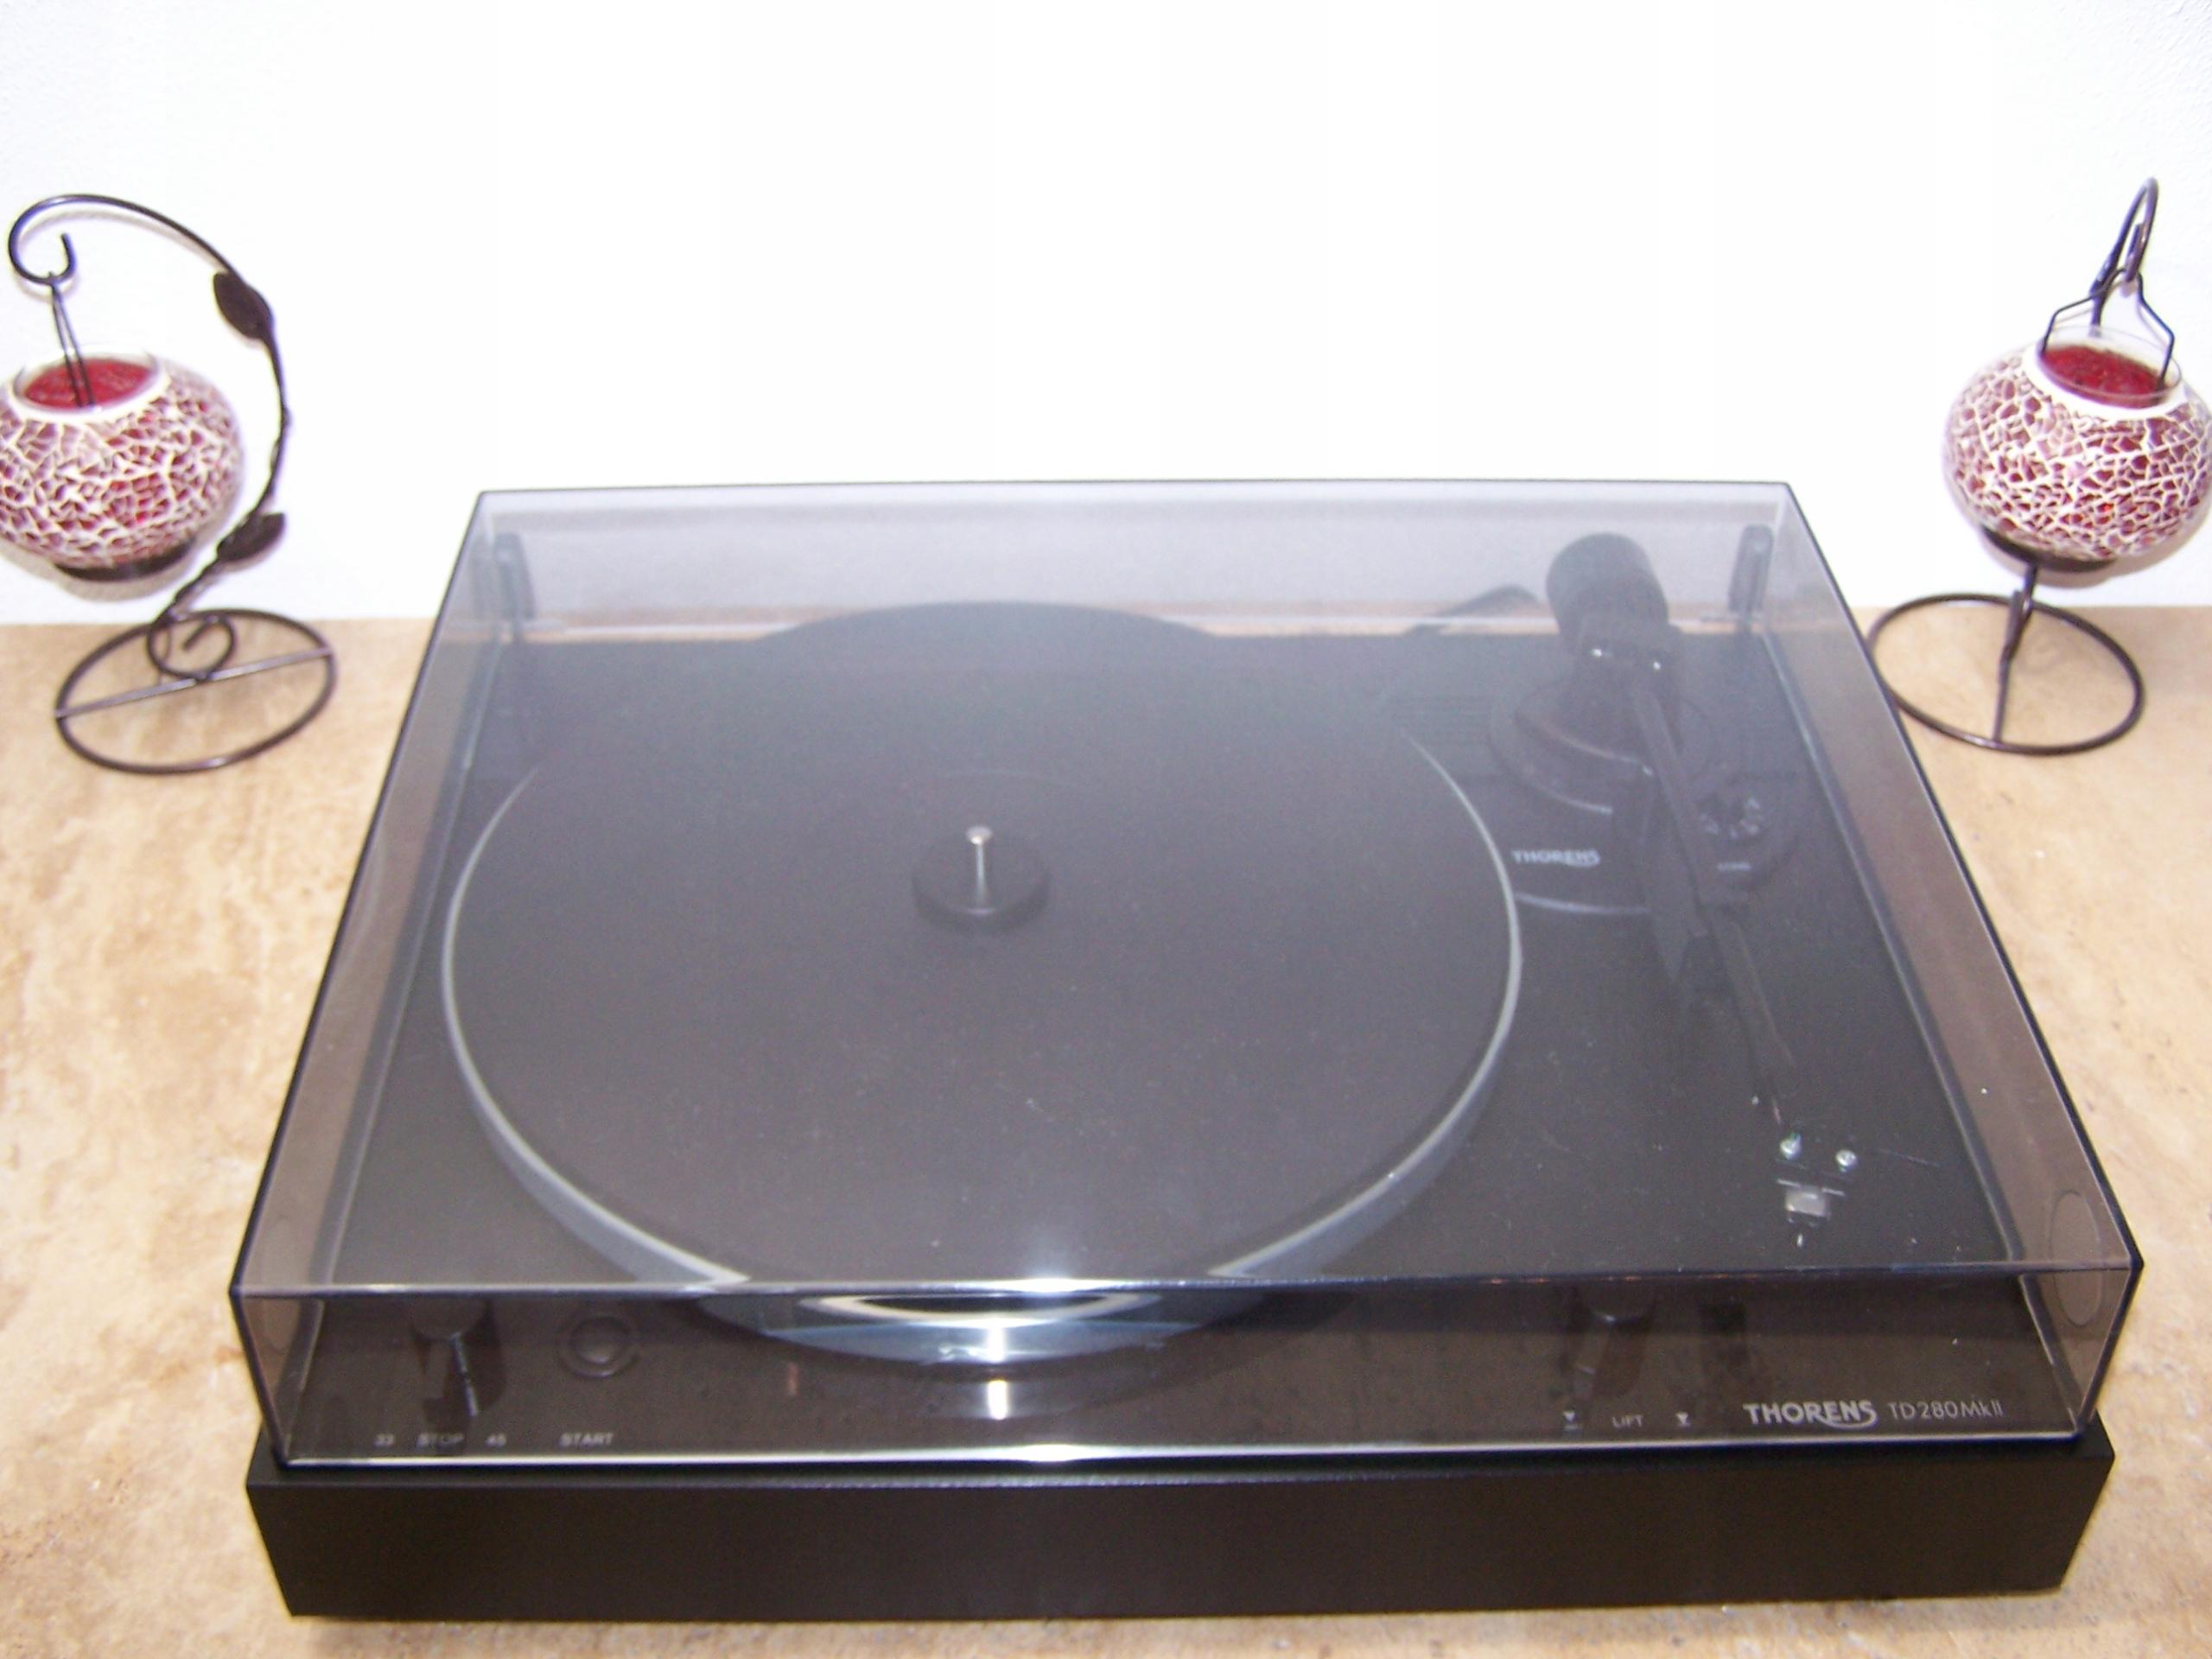 Audiofilski Thorens TD280 MK2 Stanton mk4 Śliczny